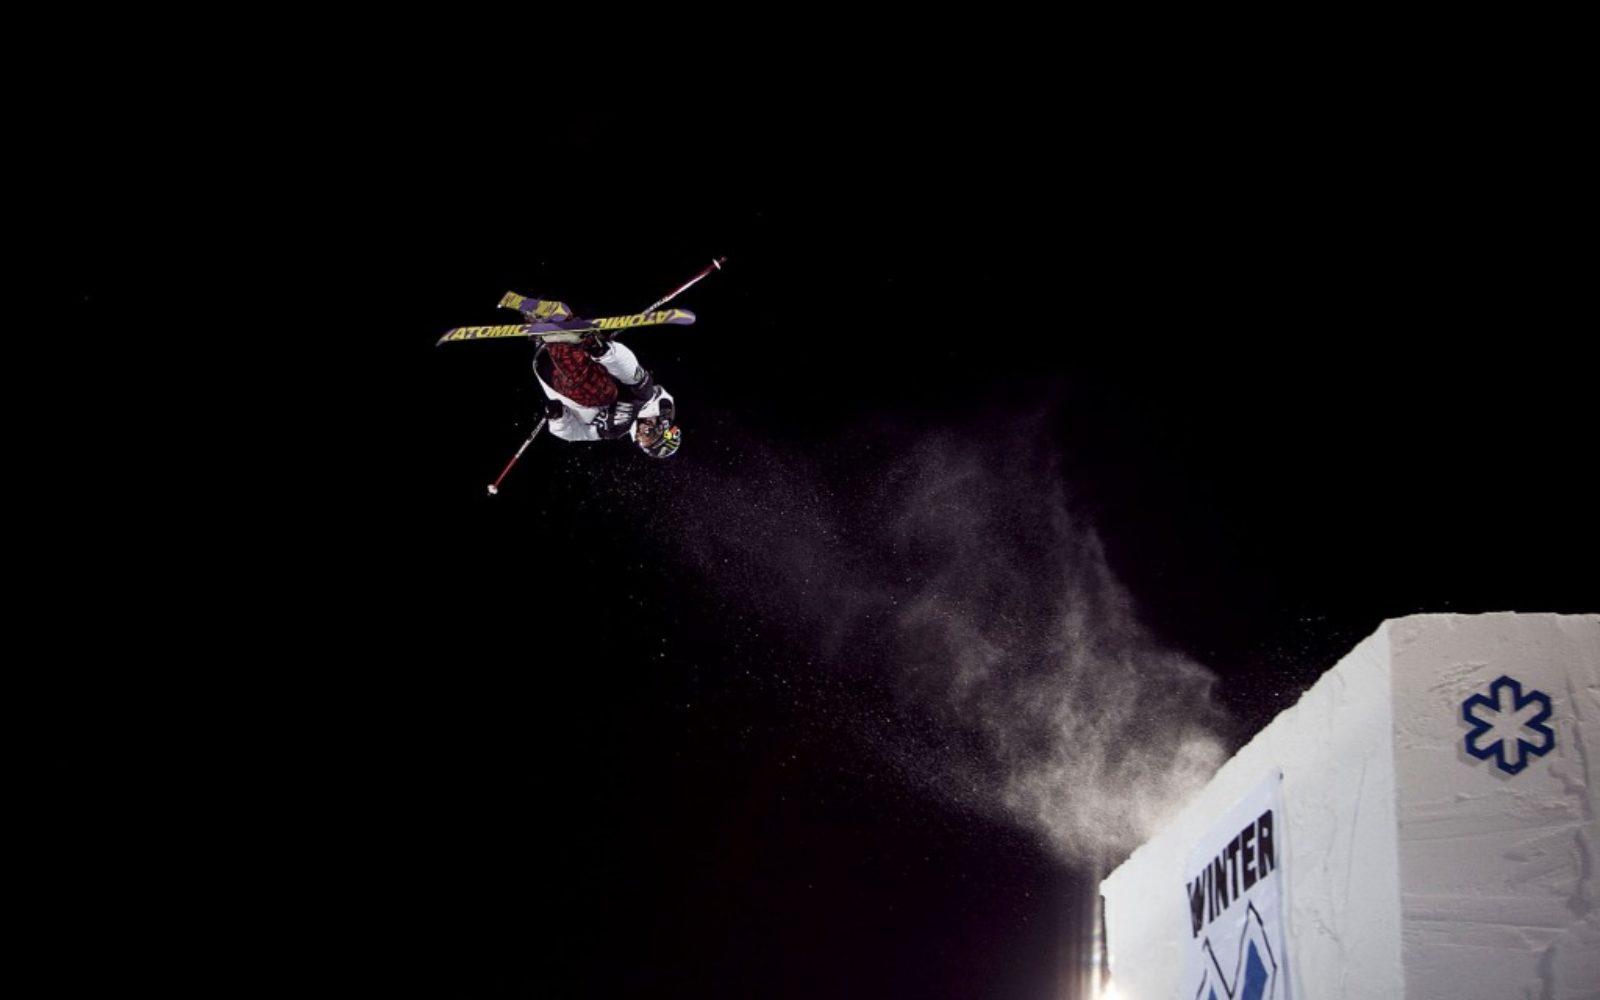 sports-xgames-skier-1024x640